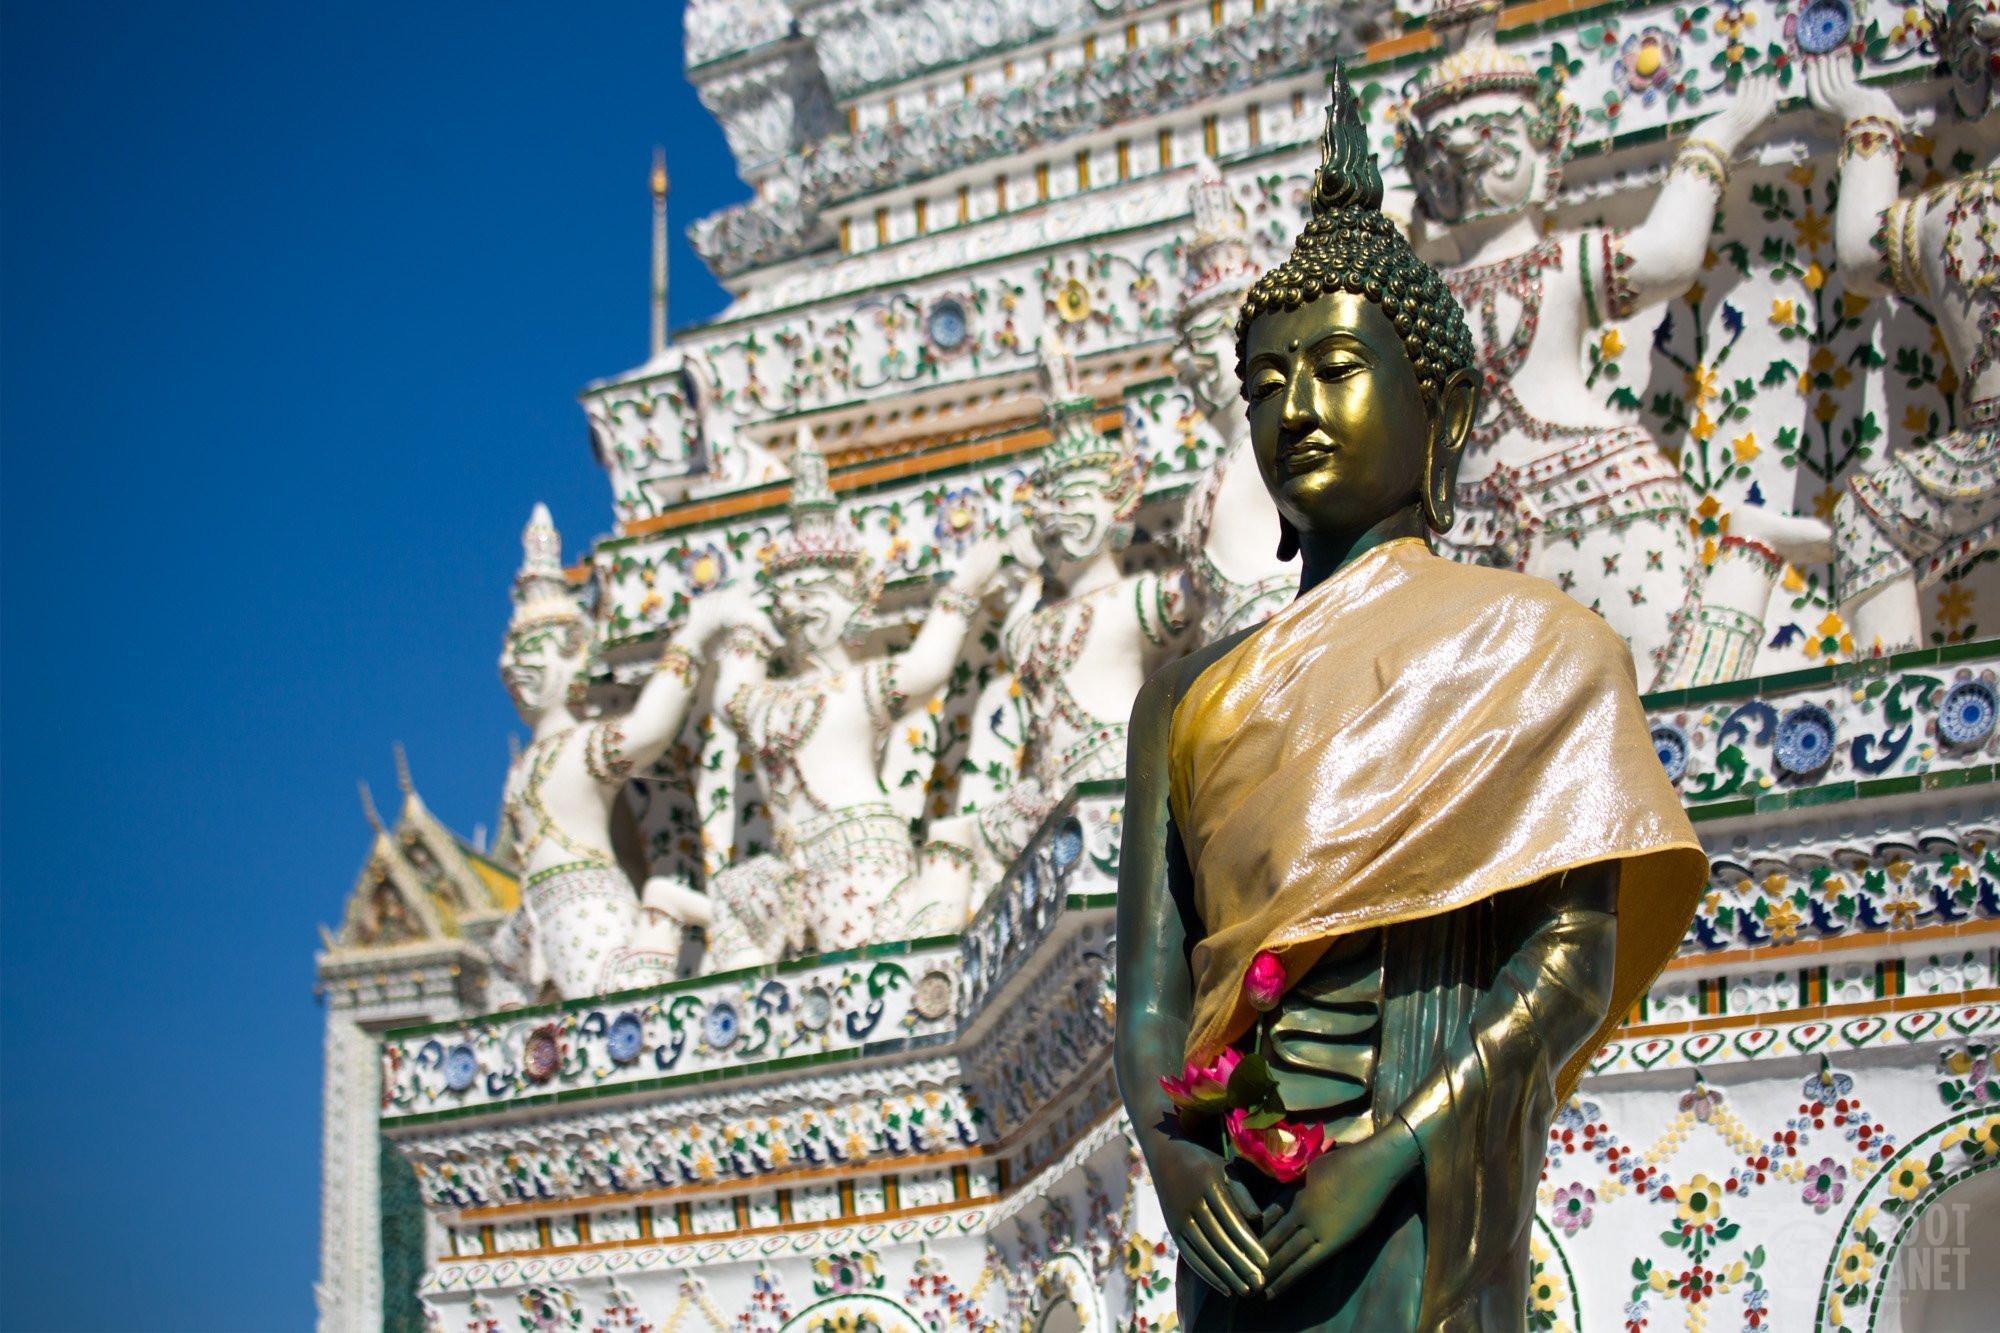 Buddha statue, Wat Arun temple, Bangkok Thailand